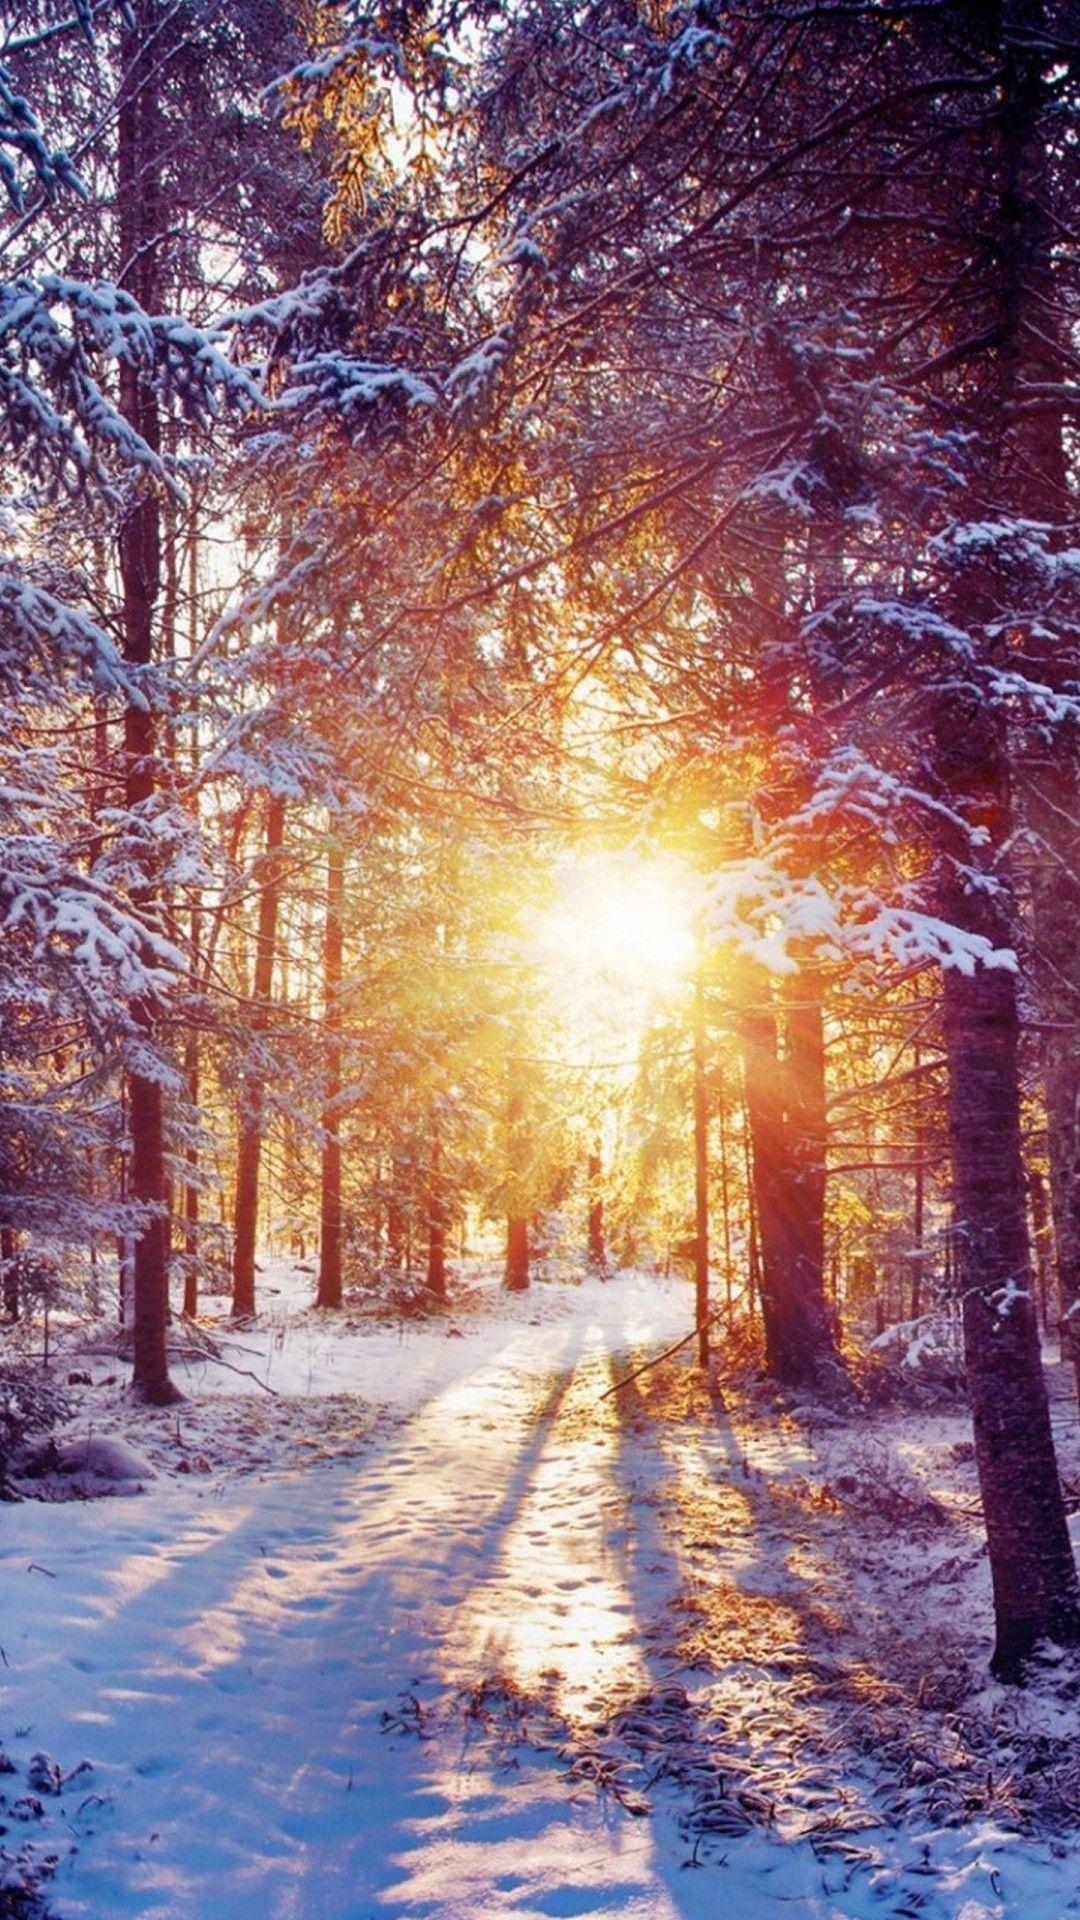 30 aesthetic scenery girly winter wallpaper iphone